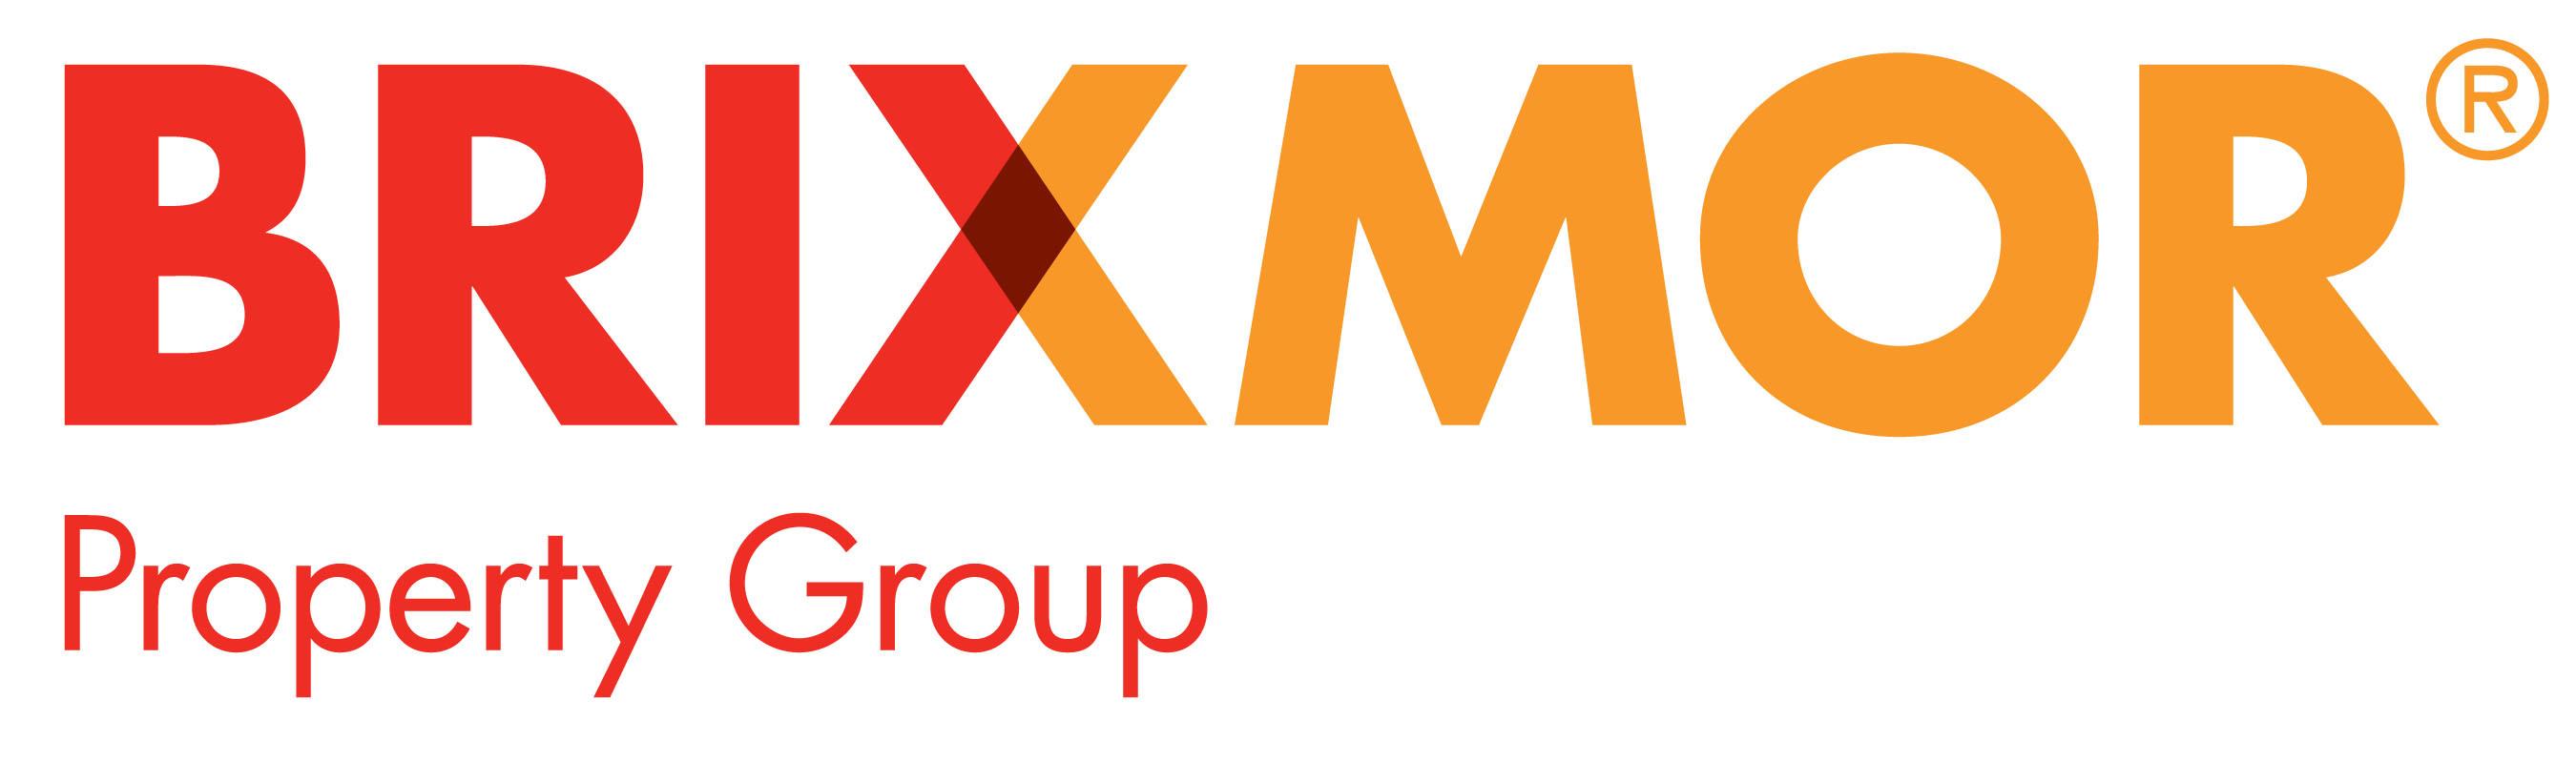 Brixmor Property Group Logo.